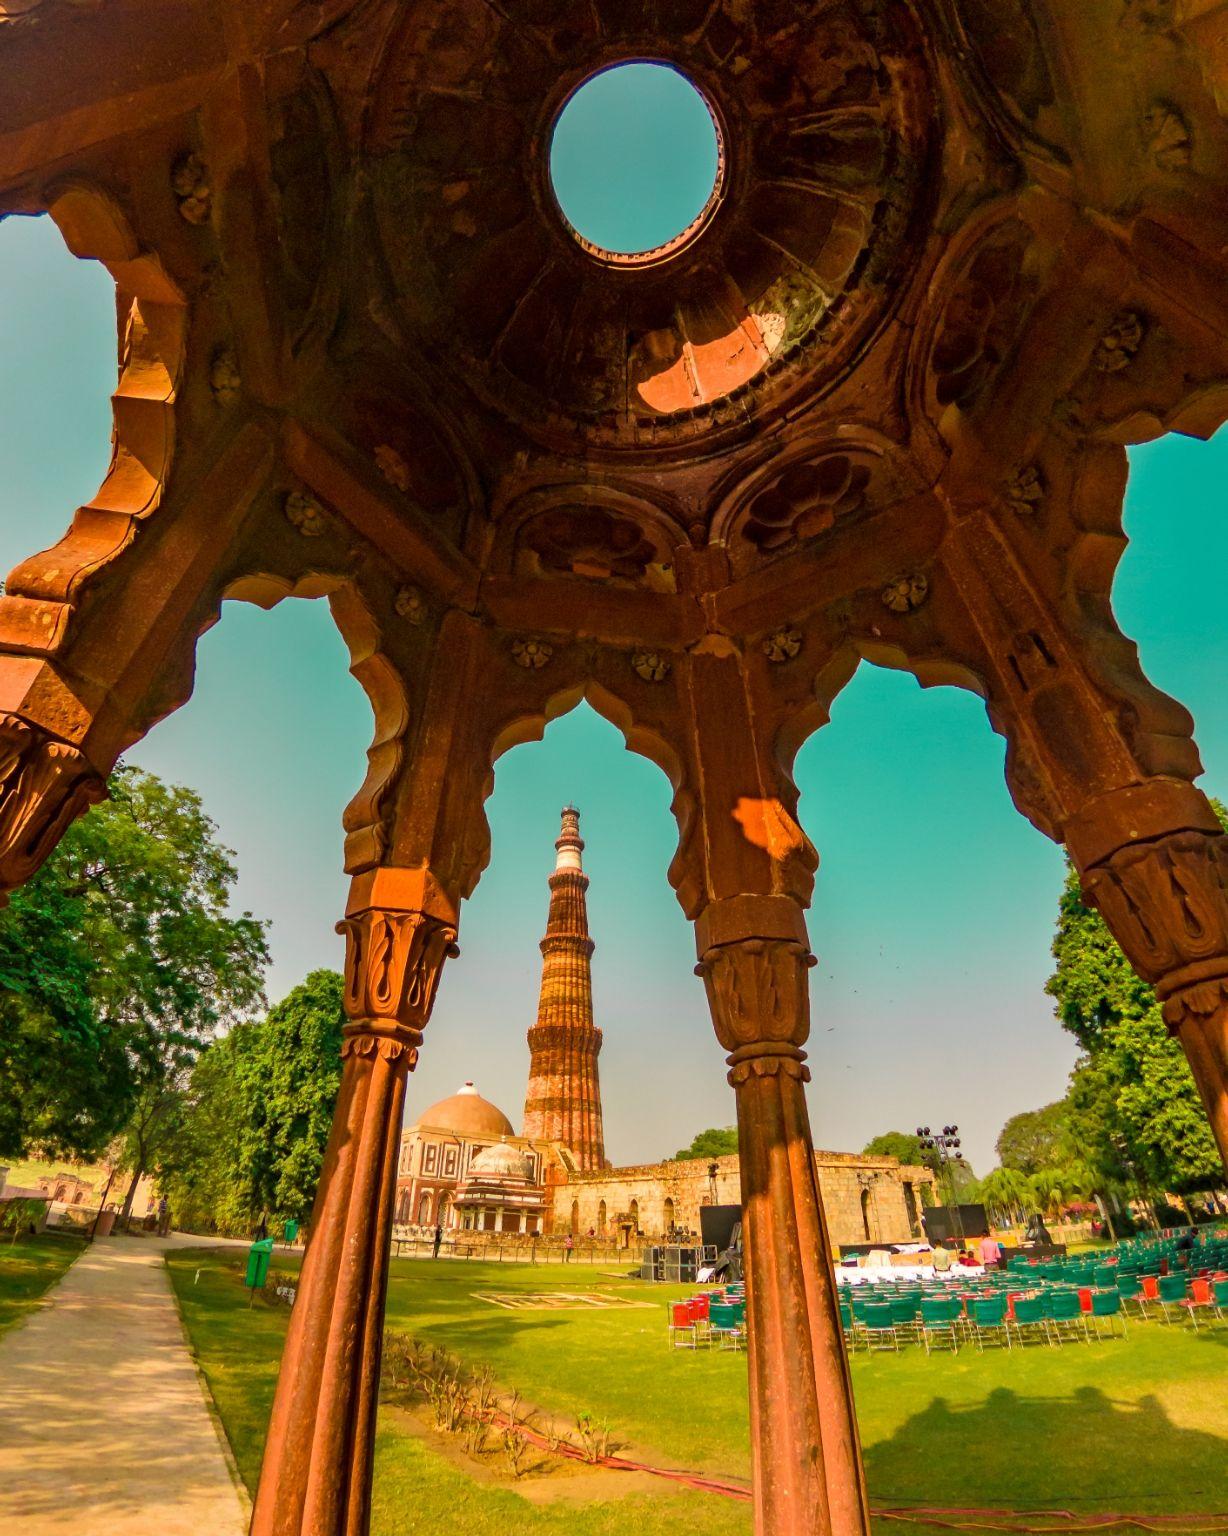 Photo of Qutub Minar By Raghav Rai Ralhan